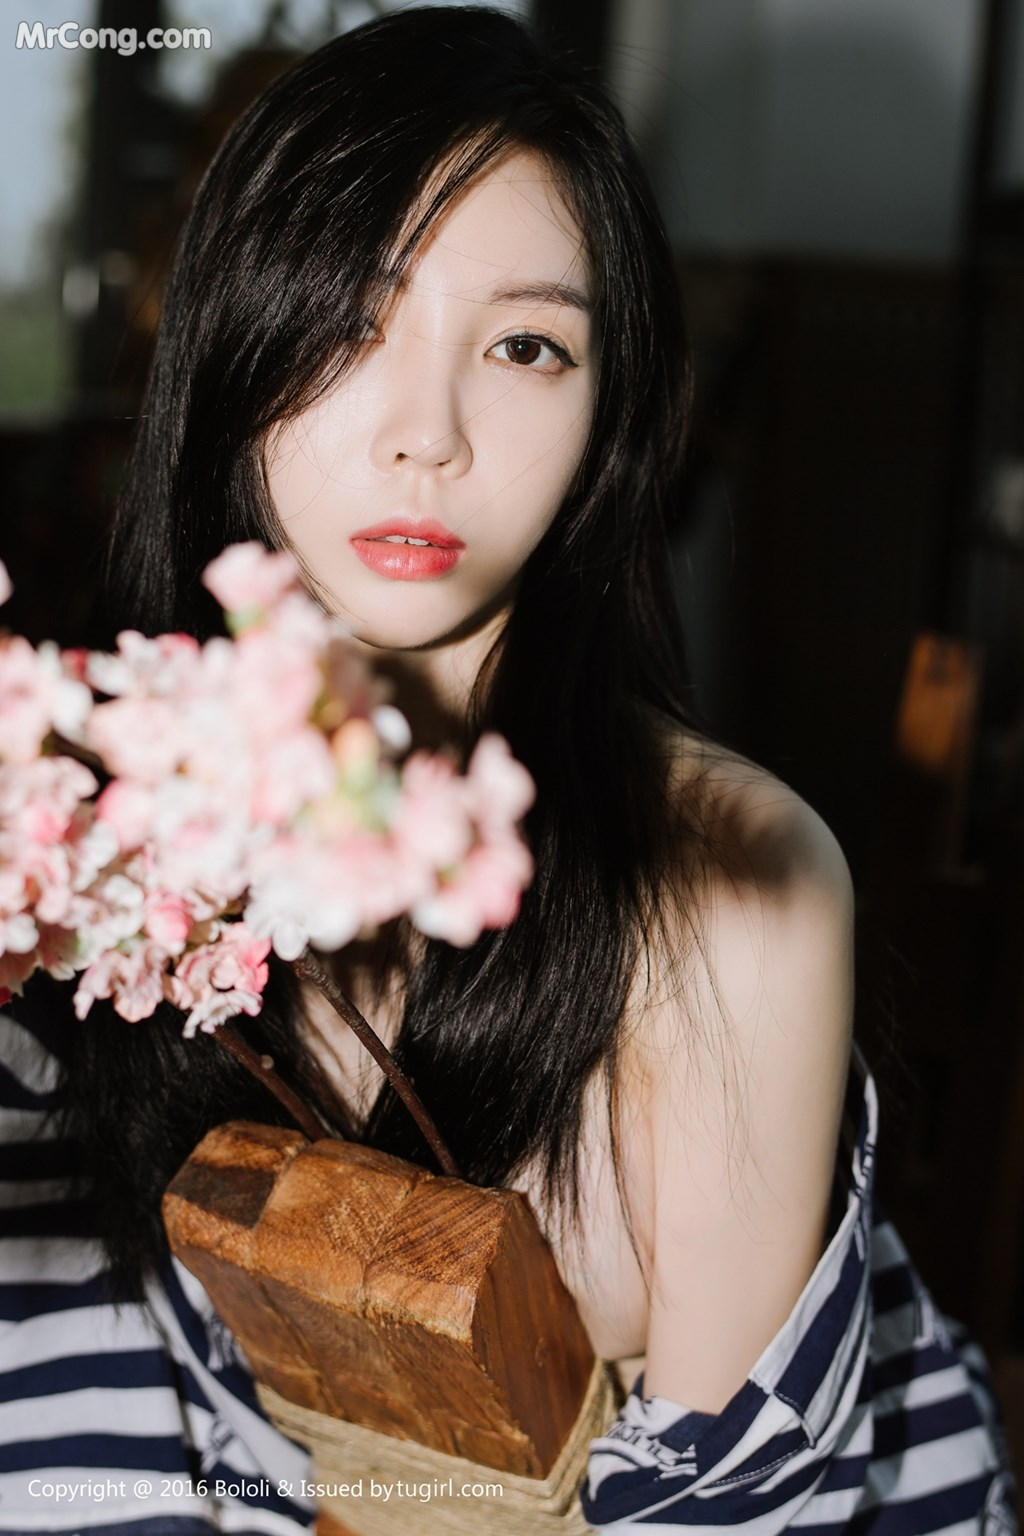 Image BoLoli-2017-09-17-Vol.118-Bebe-Kim-MrCong.com-023 in post BoLoli 2017-09-17 Vol.118: Người mẫu Bebe_Kim (48 ảnh)